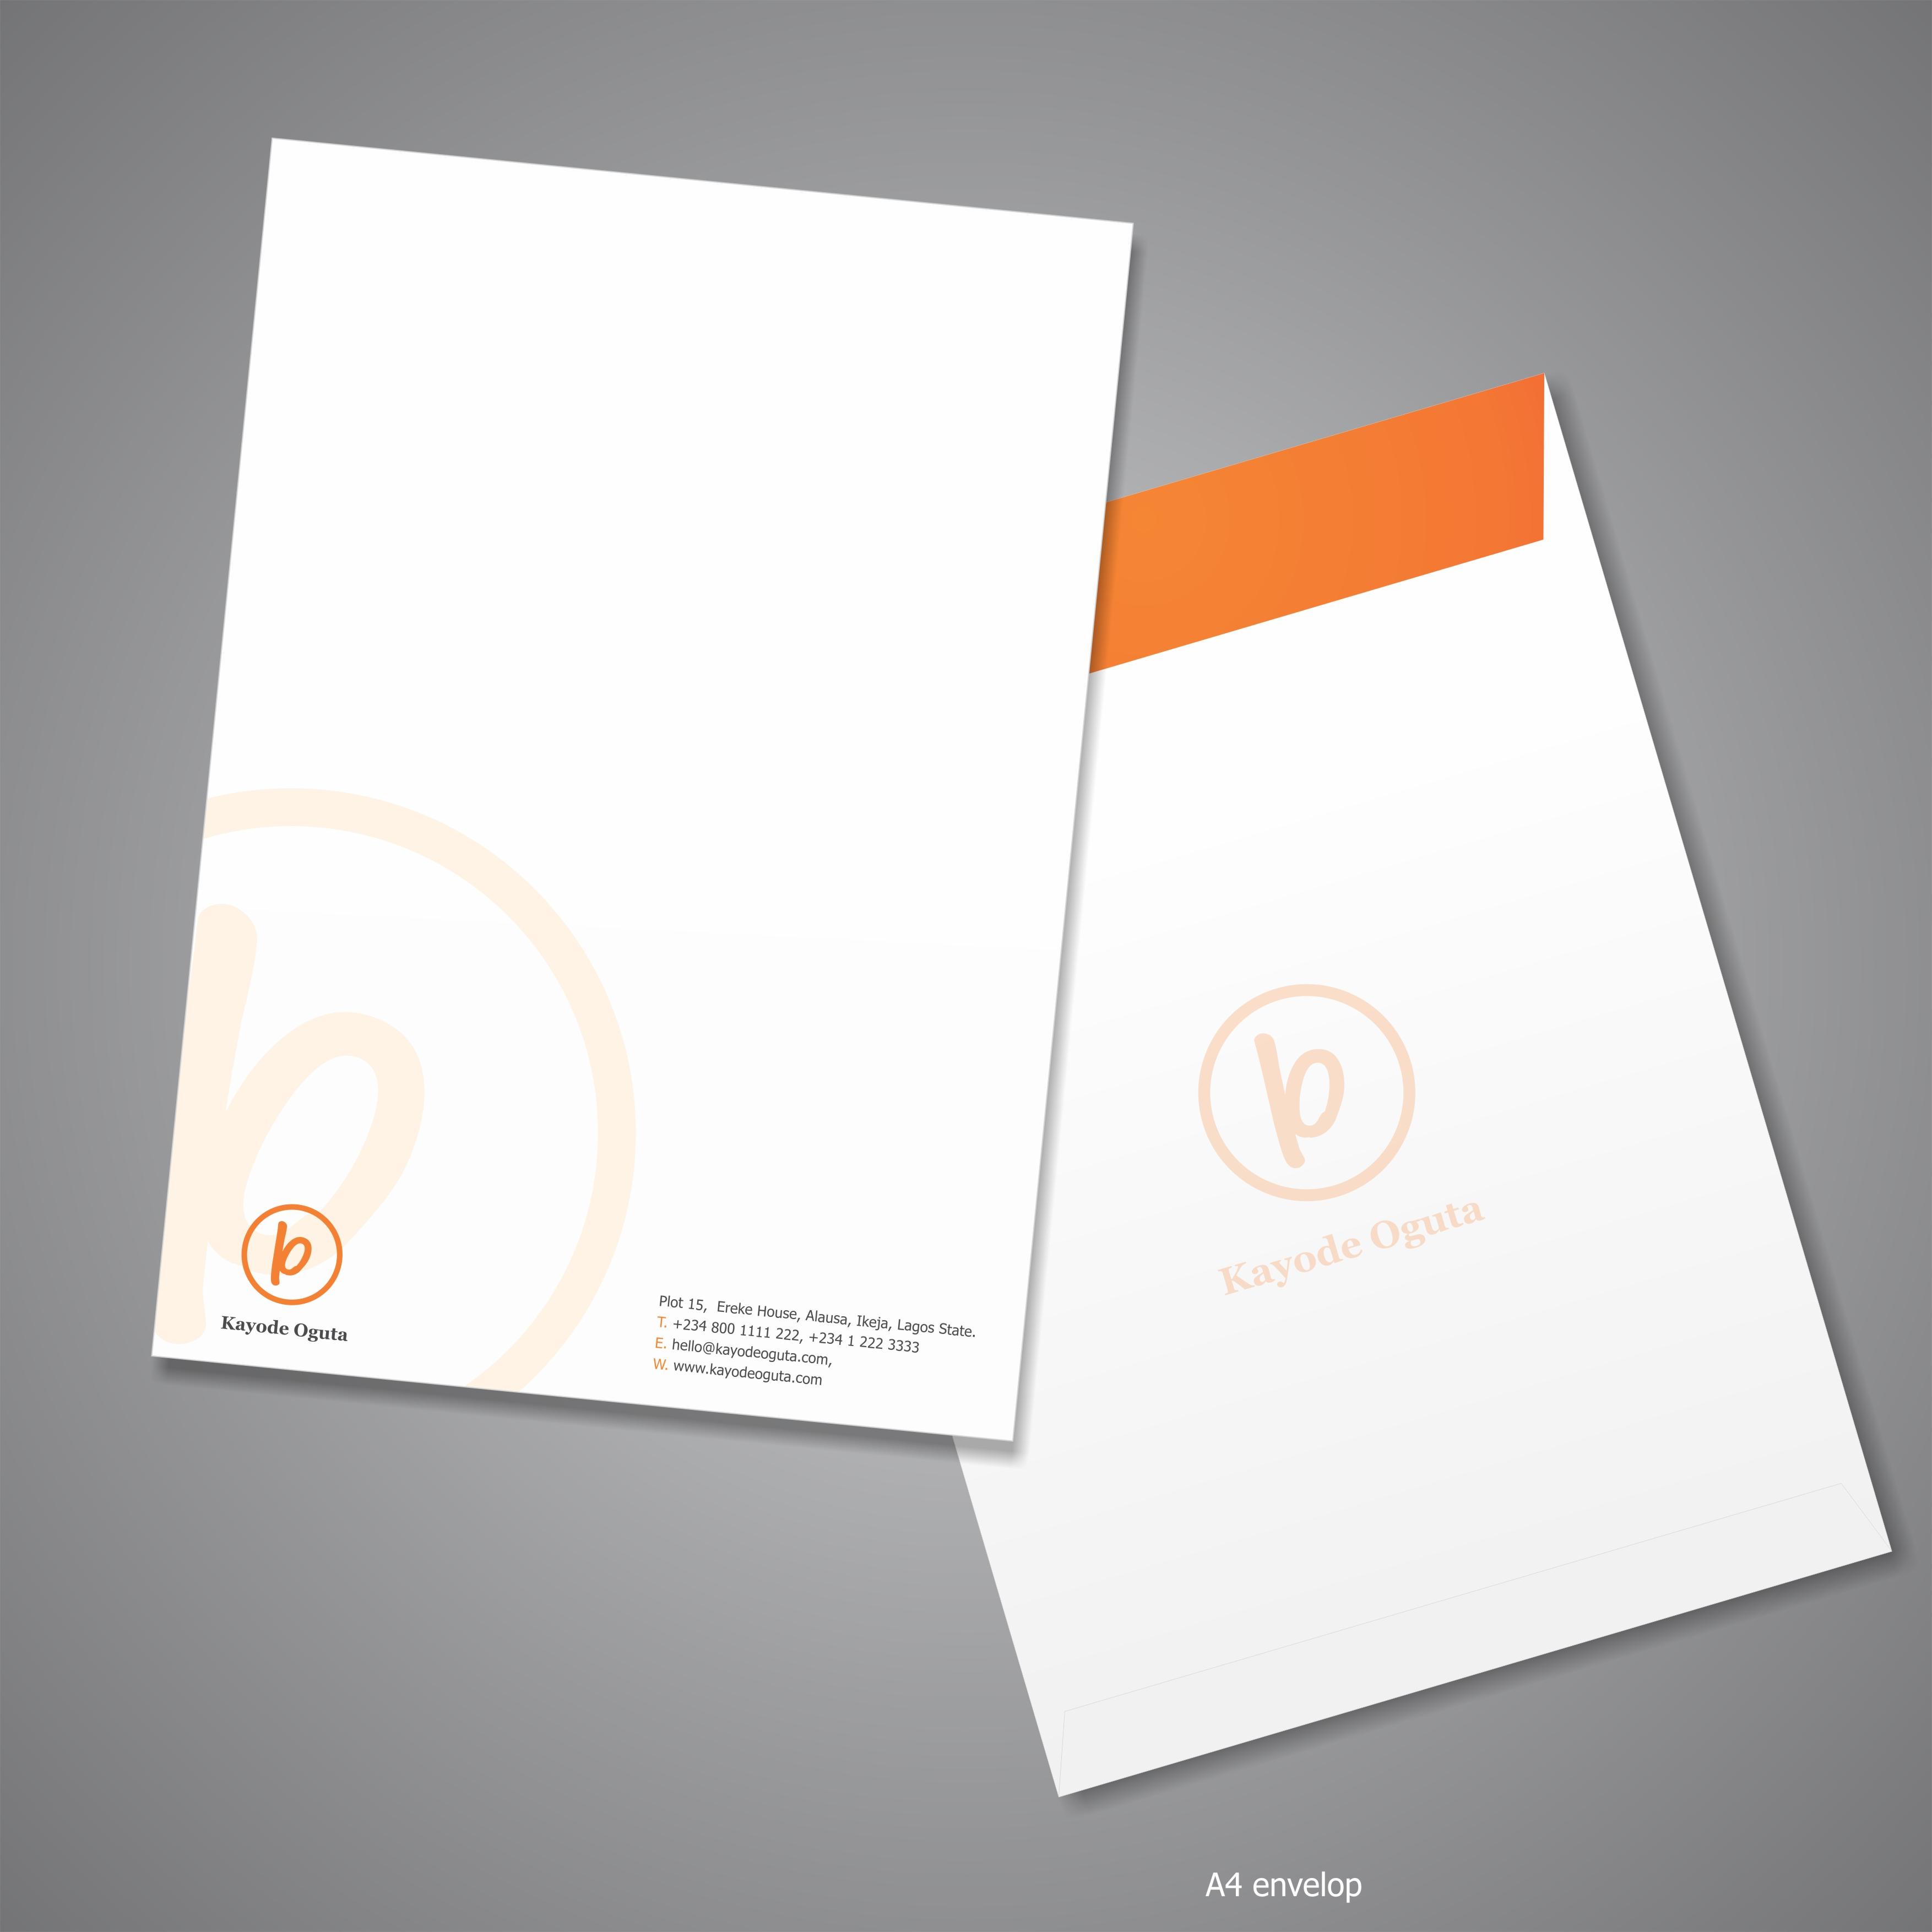 Kayode Oguta A4 envelope – SwiftThink